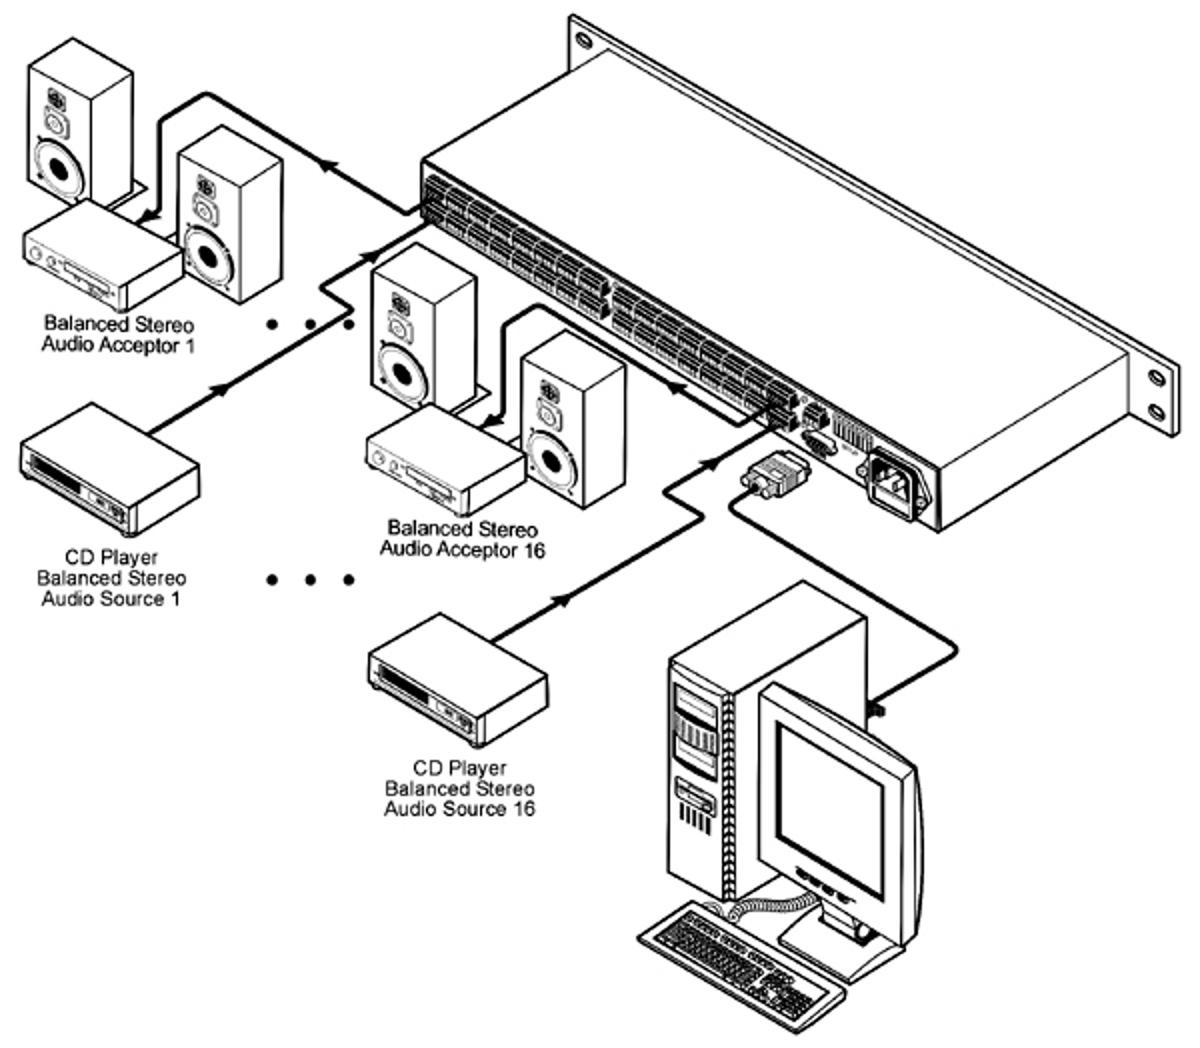 kramer va-8xl 81-0032810 8 channel balanced stereo audio amplifier